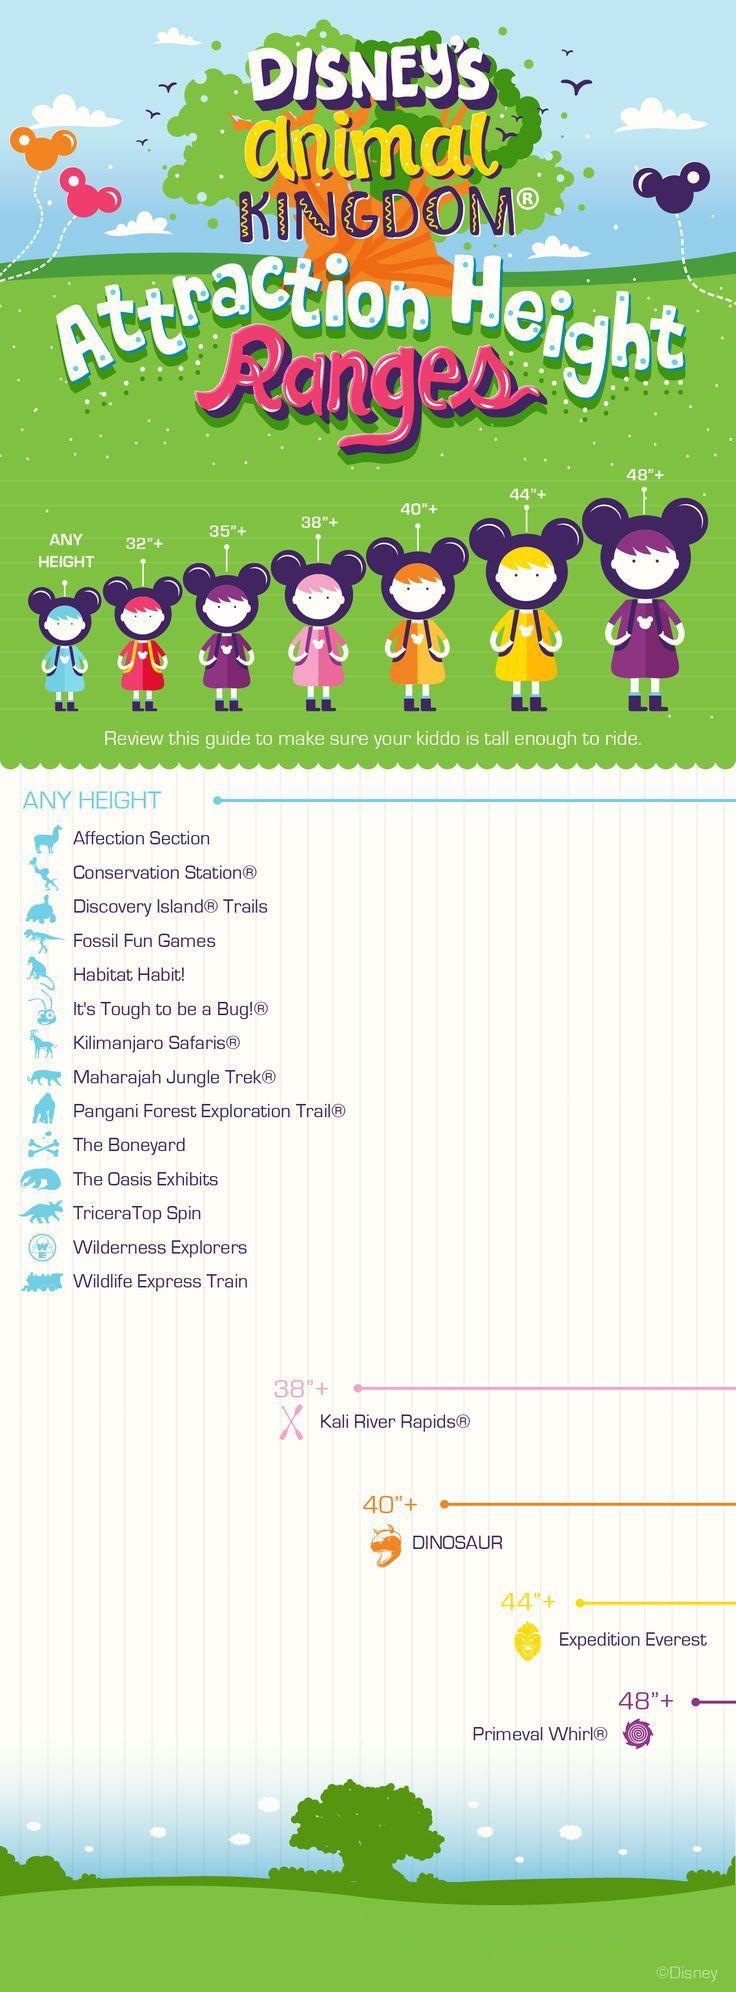 Best 25+ Walt disney travel company ideas on Pinterest | Walt ...